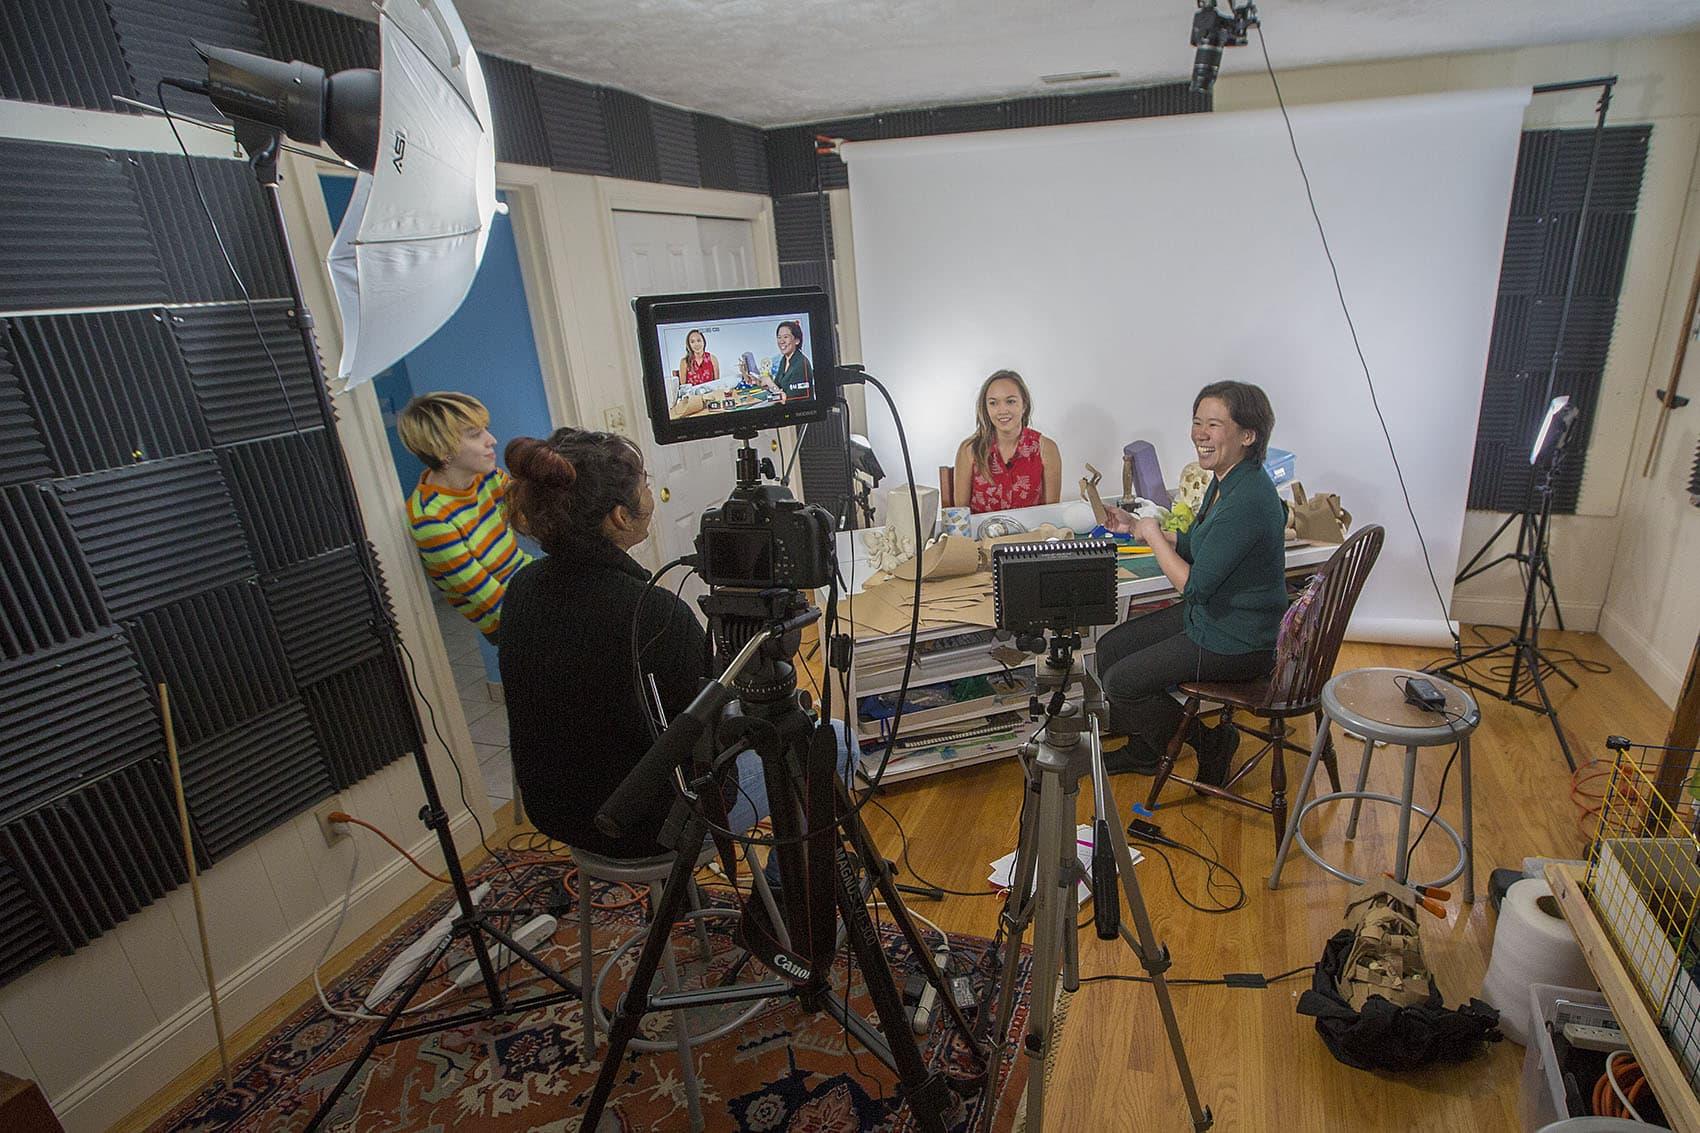 Art Prof co-founder Clara Lieu (far right) jokes with teaching assistants Annelise Yee, Deepti Menon and Lauryn Welch. (Jesse Costa/WBUR)